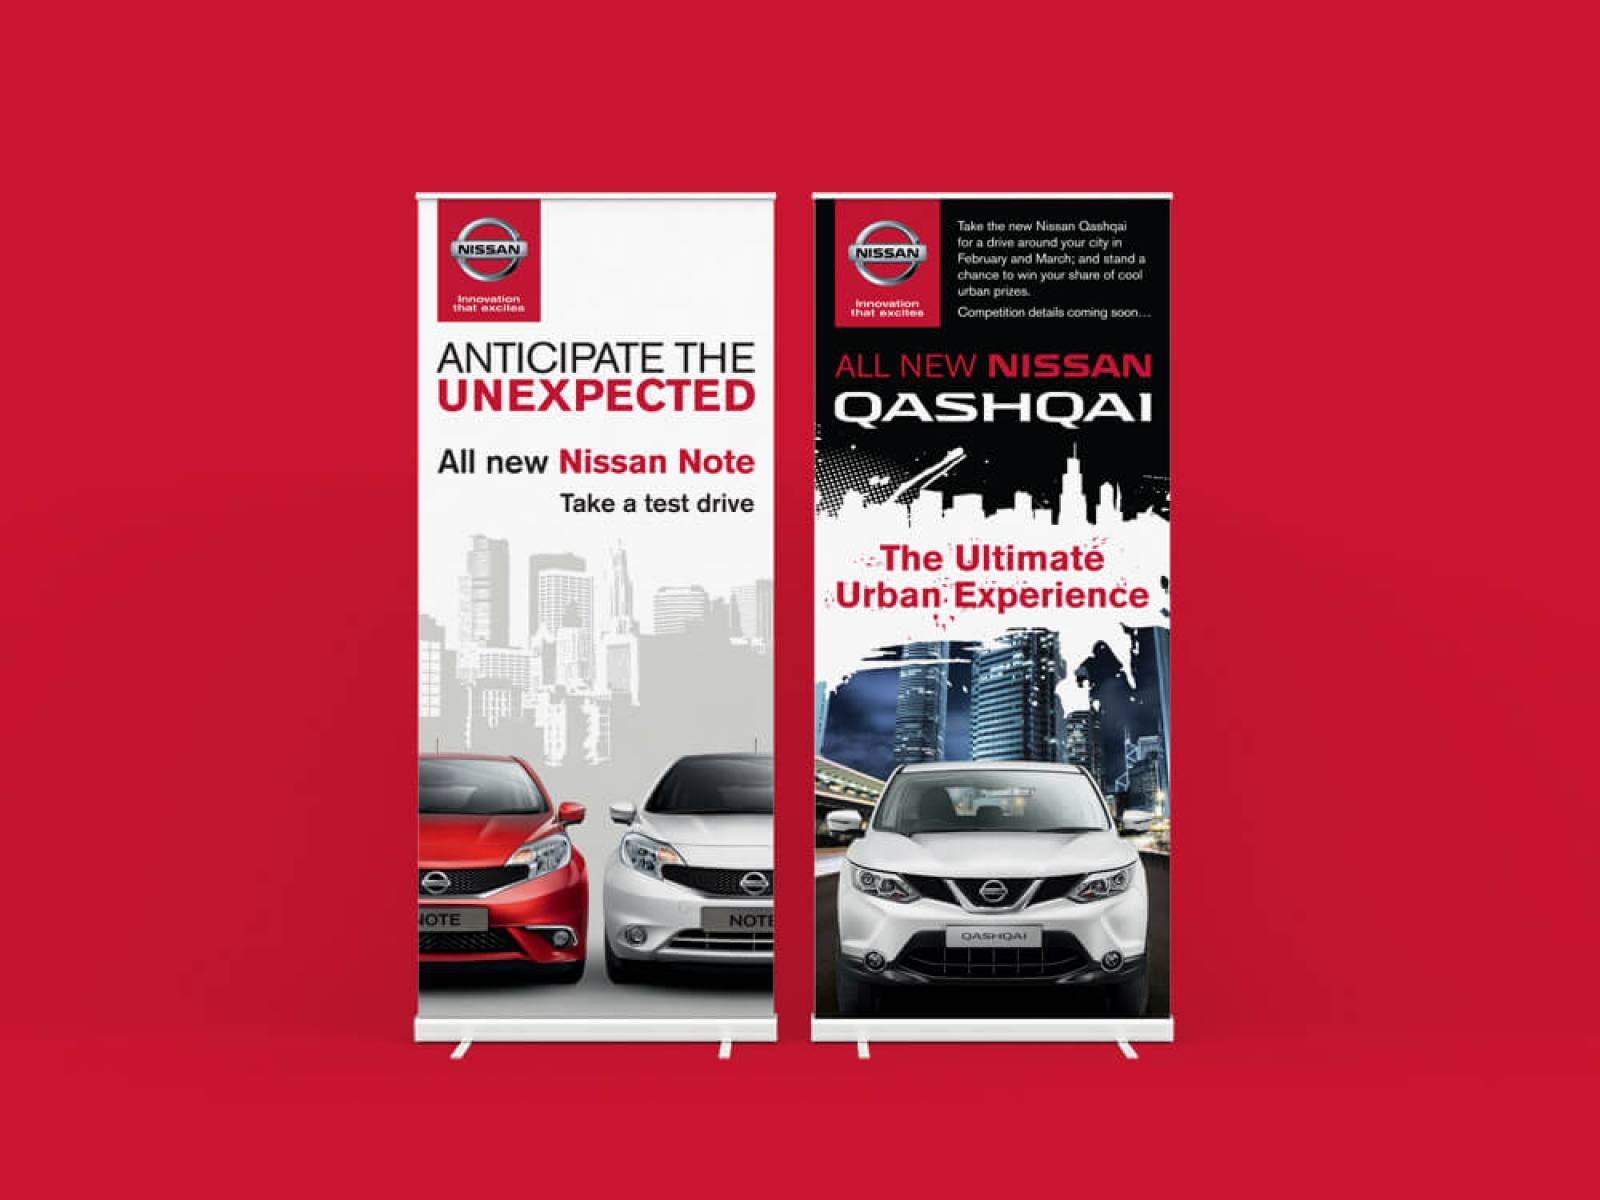 Exhibition-Nissan-banner-design-agency-graphic-design-canterbury-02.jpg